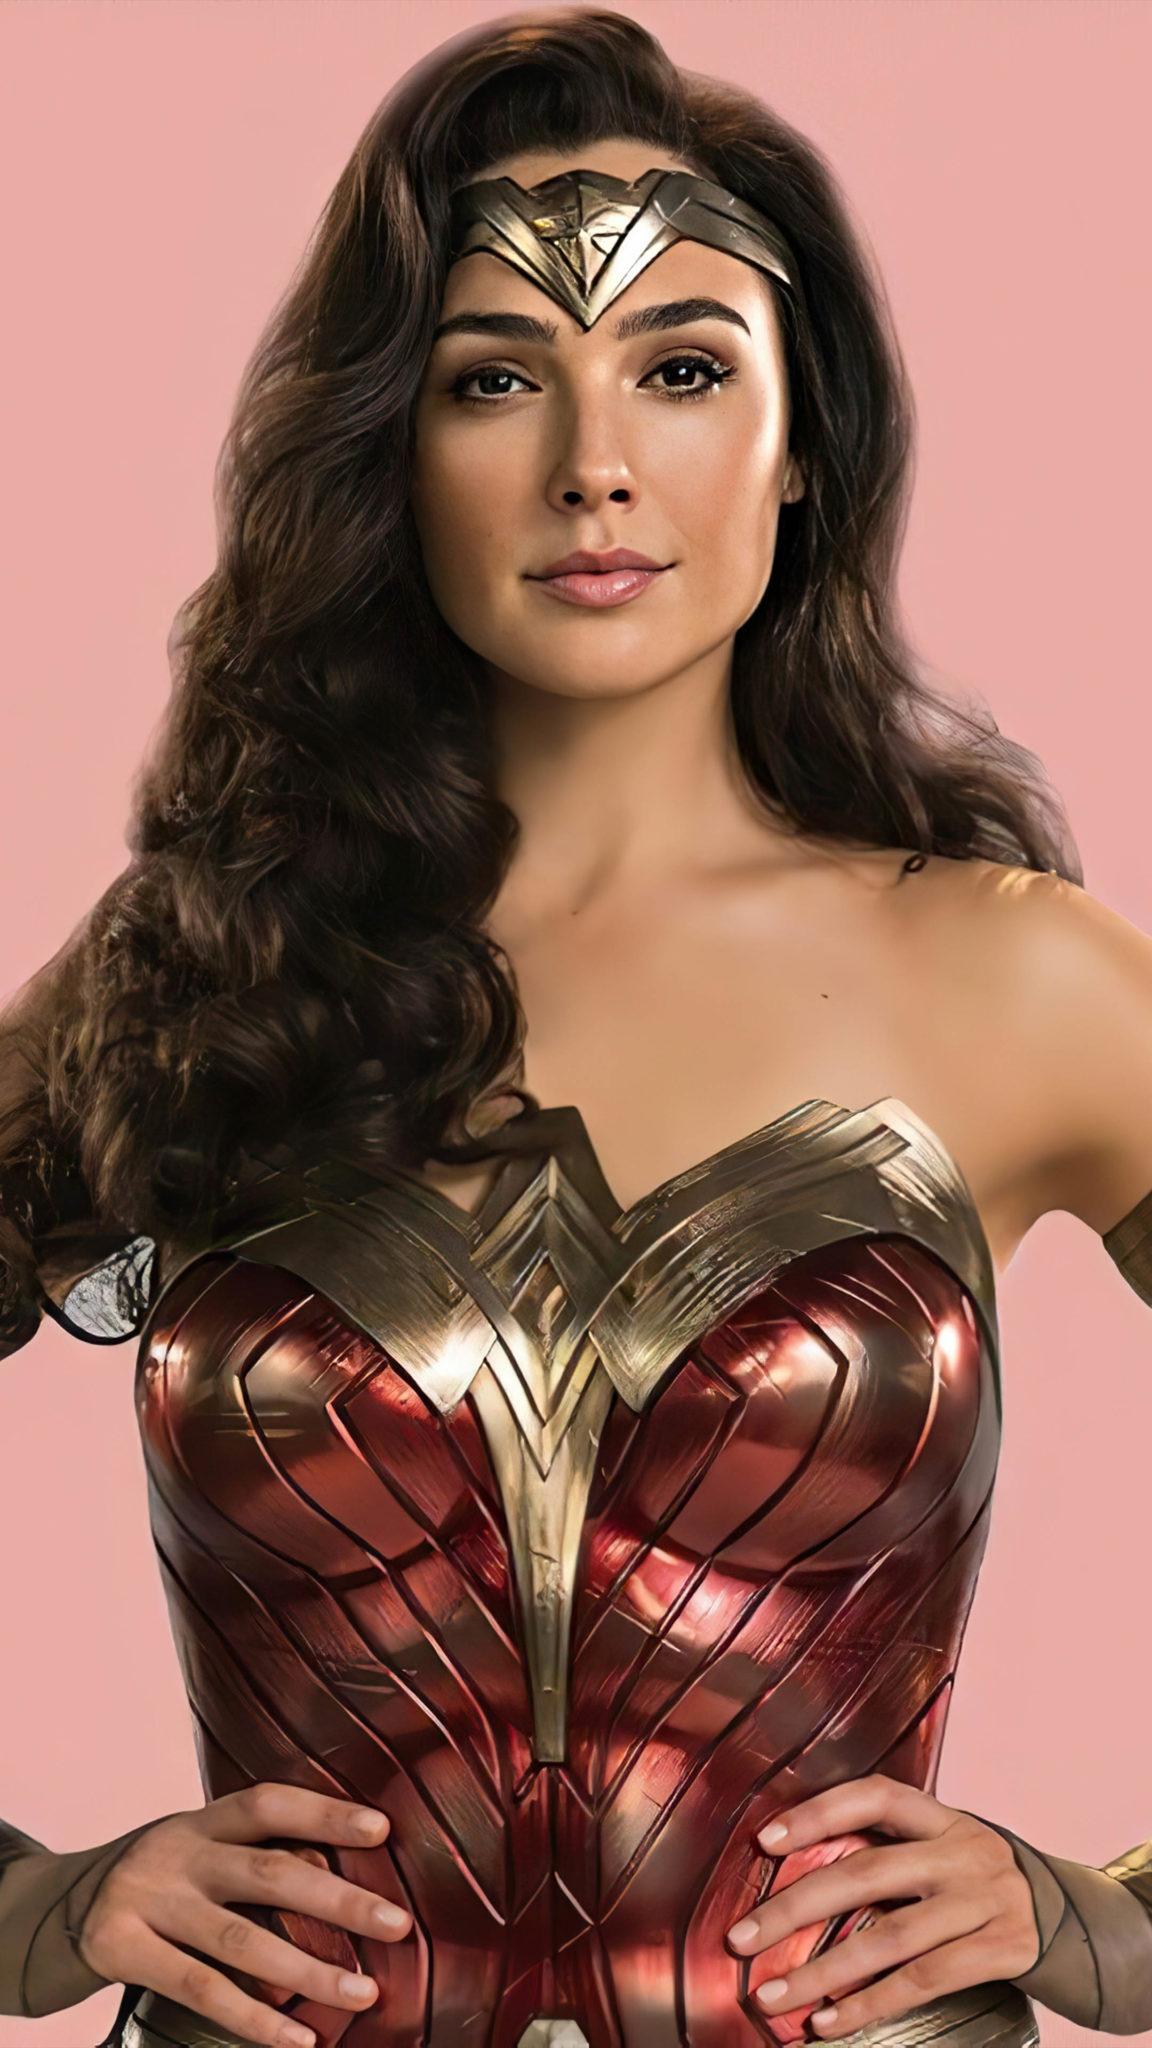 Gal Gadot In Movie Wonder Woman 1984 4K Ultra HD Mobile